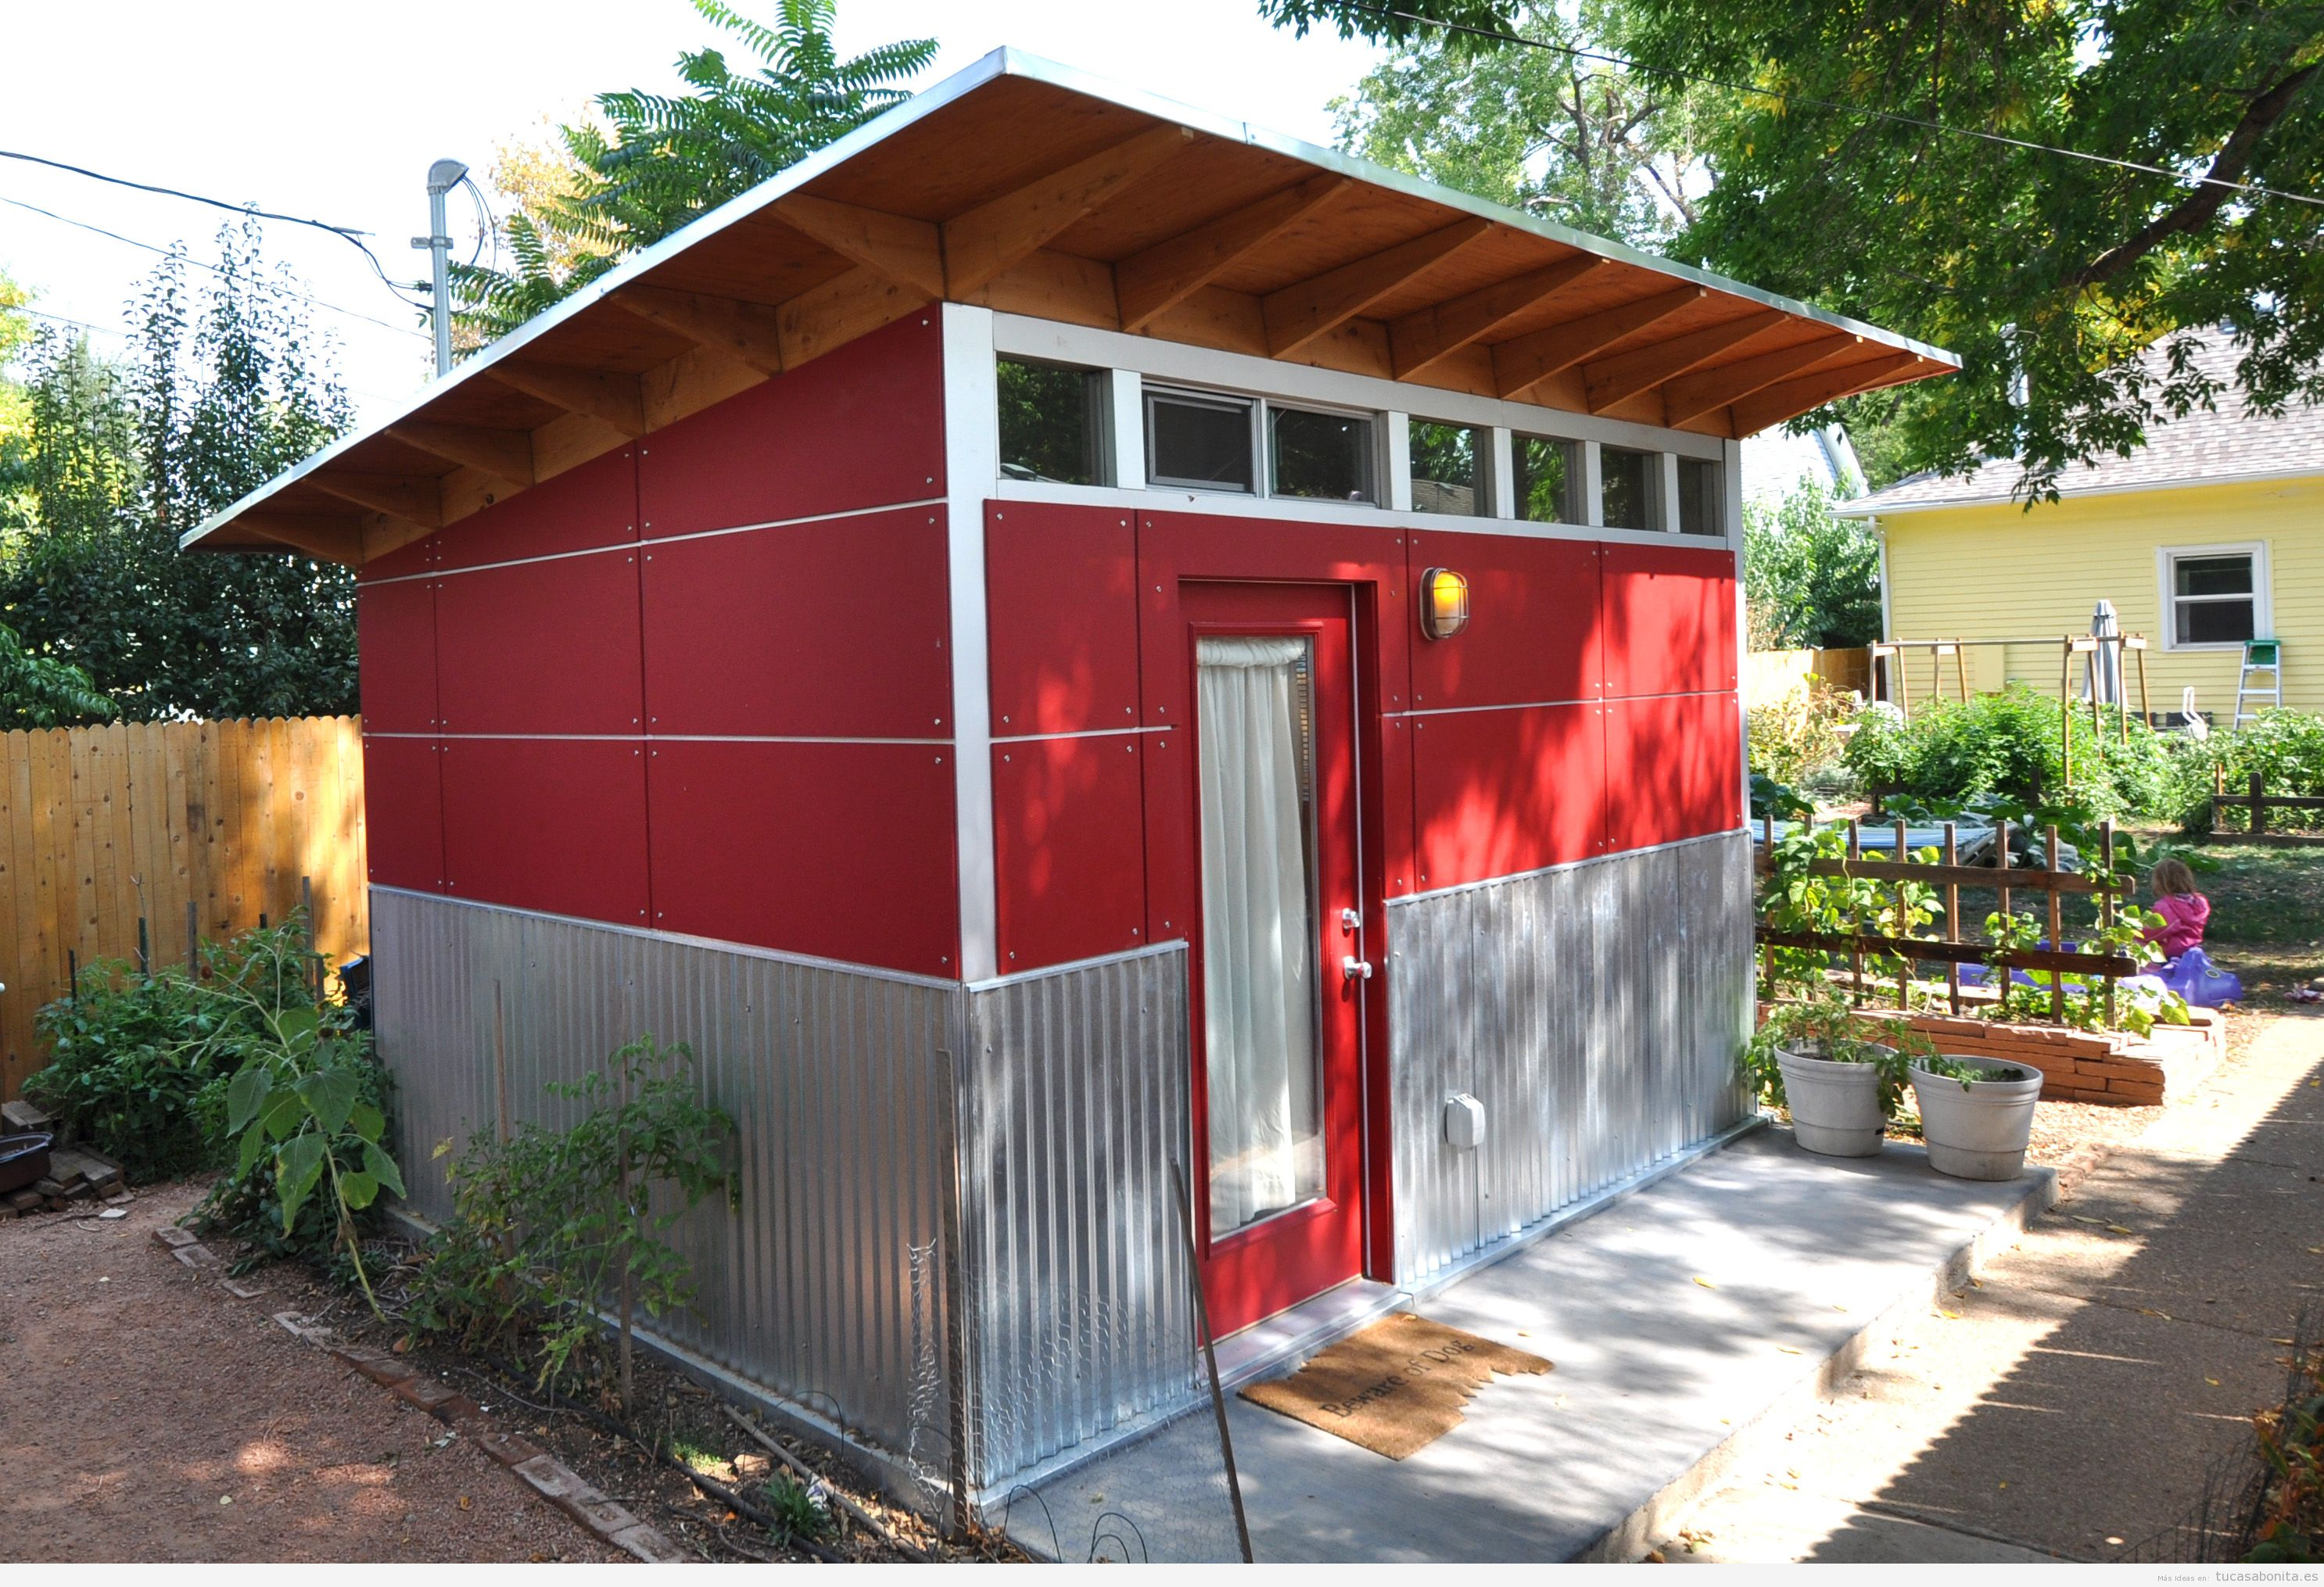 Cobertizos de madera para jardin baratos materiales de for Cobertizo de madera ideas de disenos